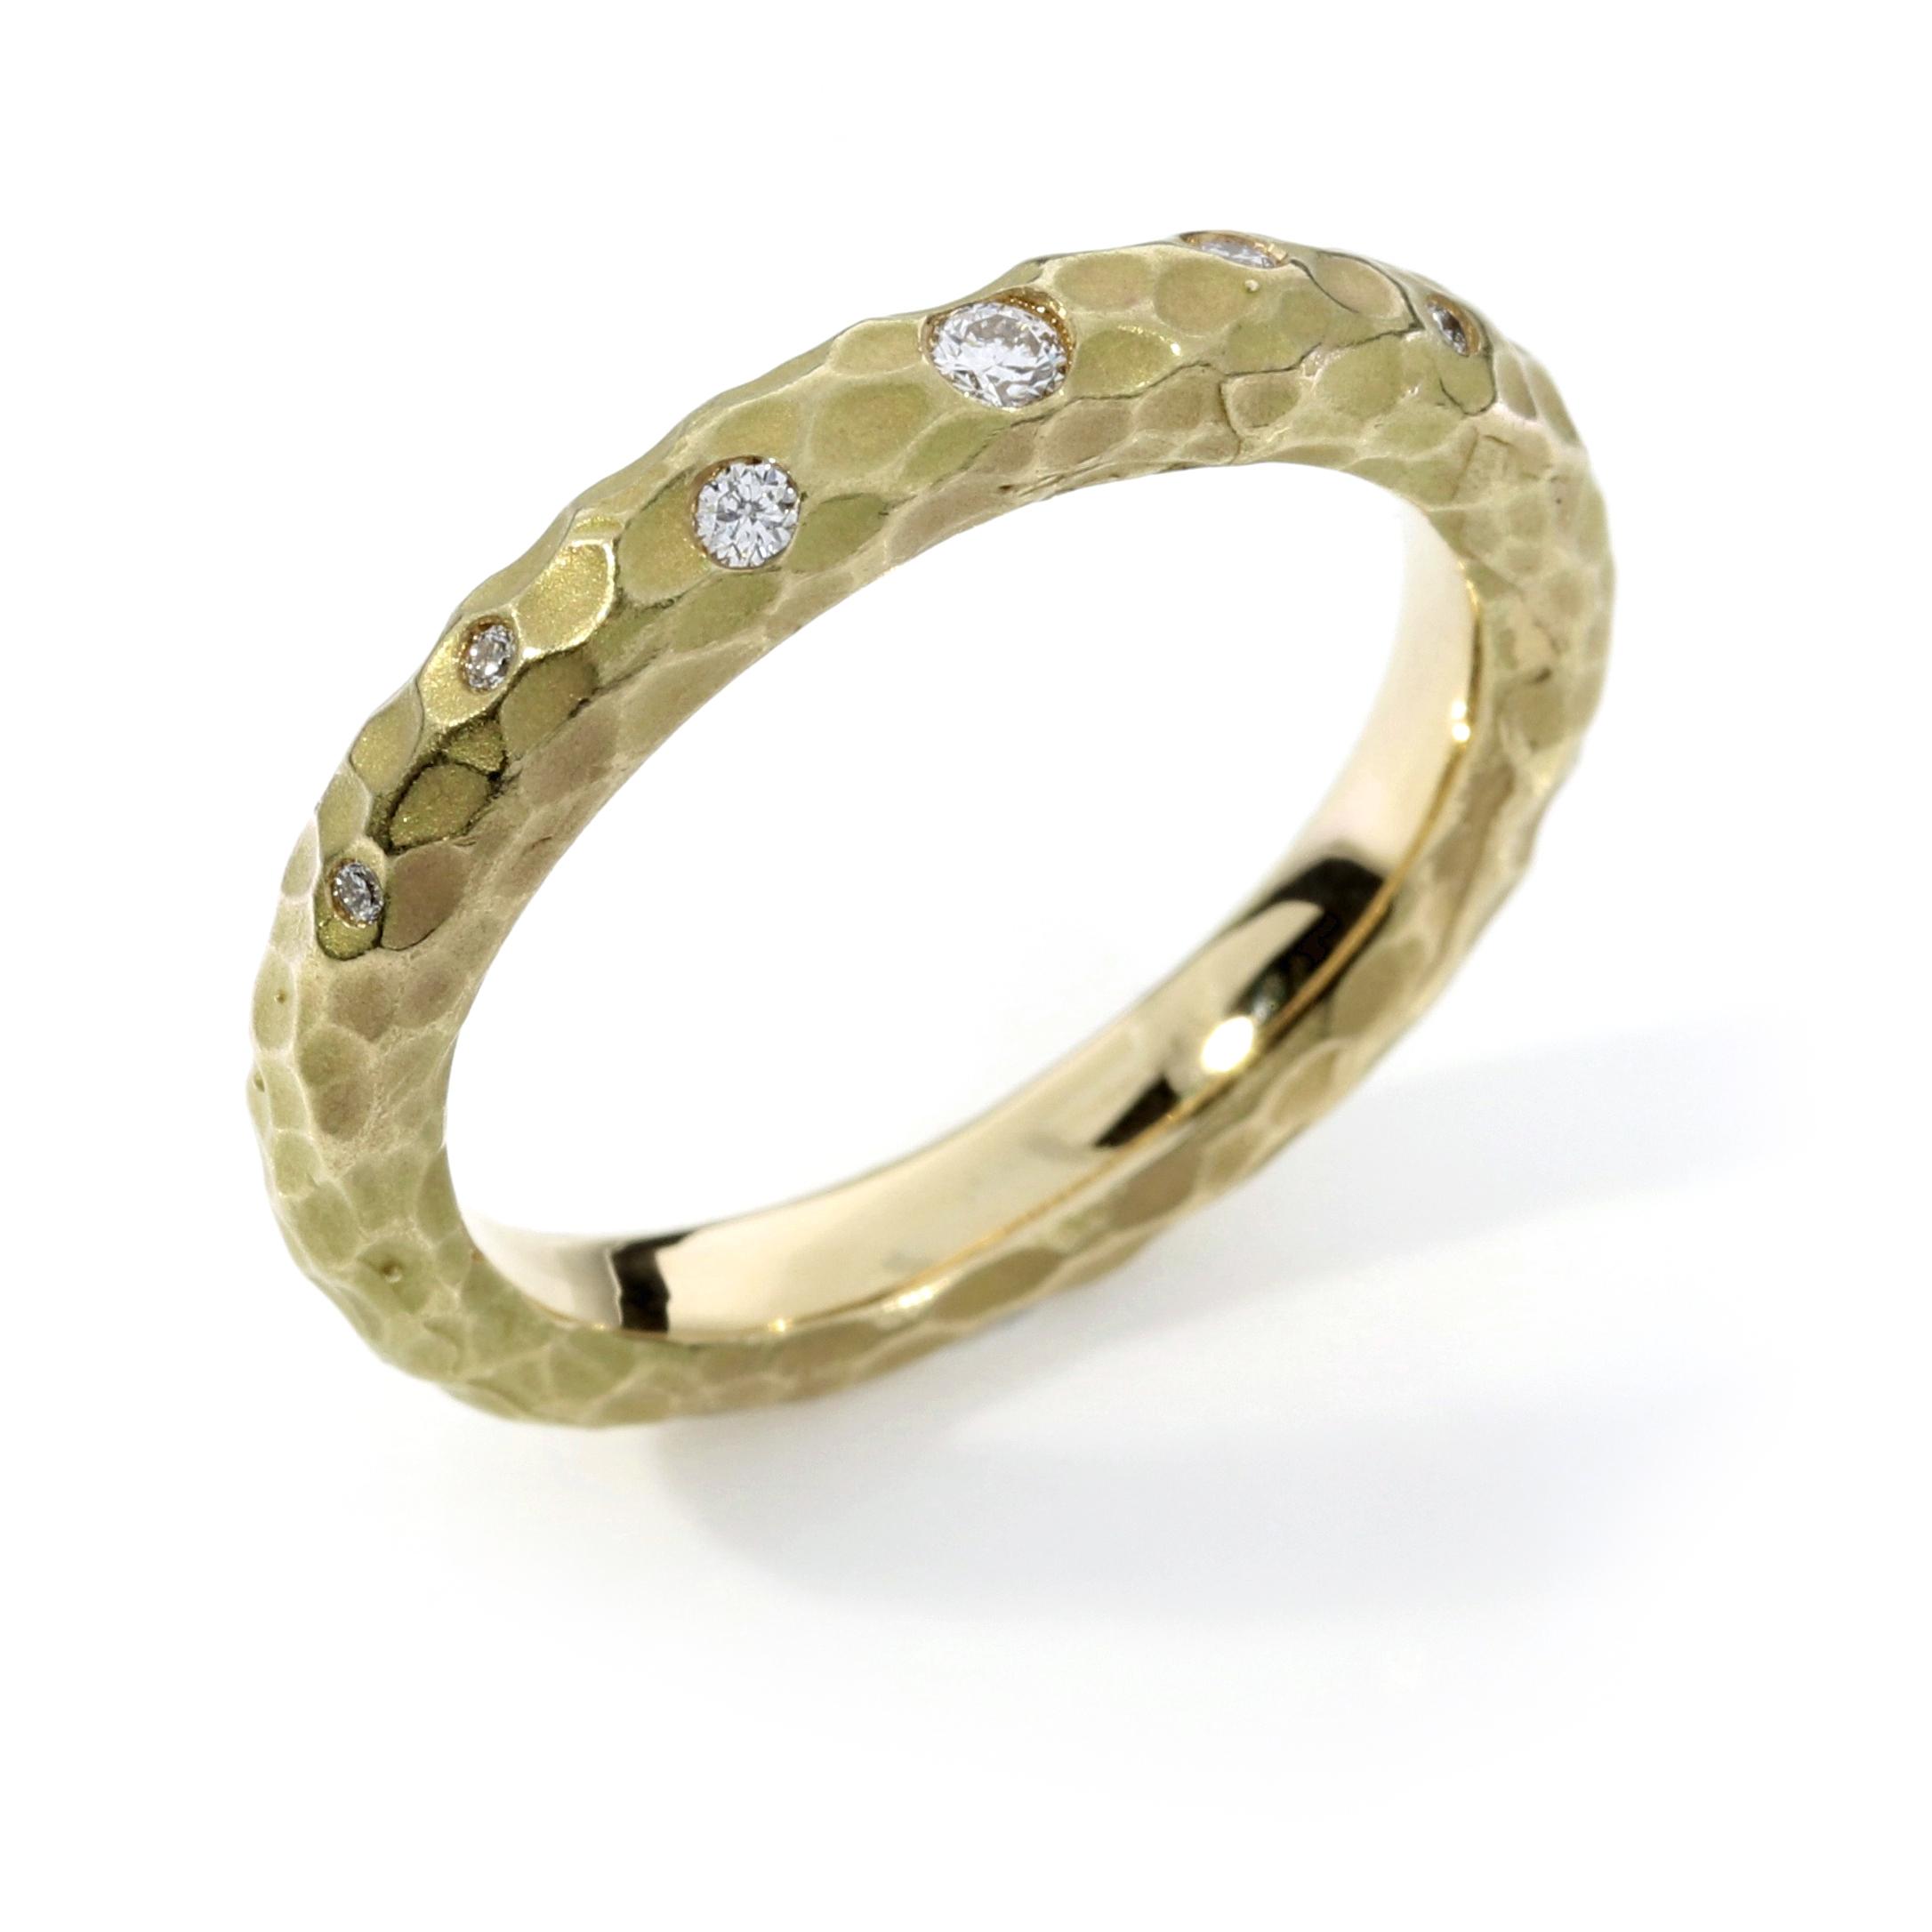 Verlobungsring Fairtrade Gelbgold Brillanten Australien (251232)